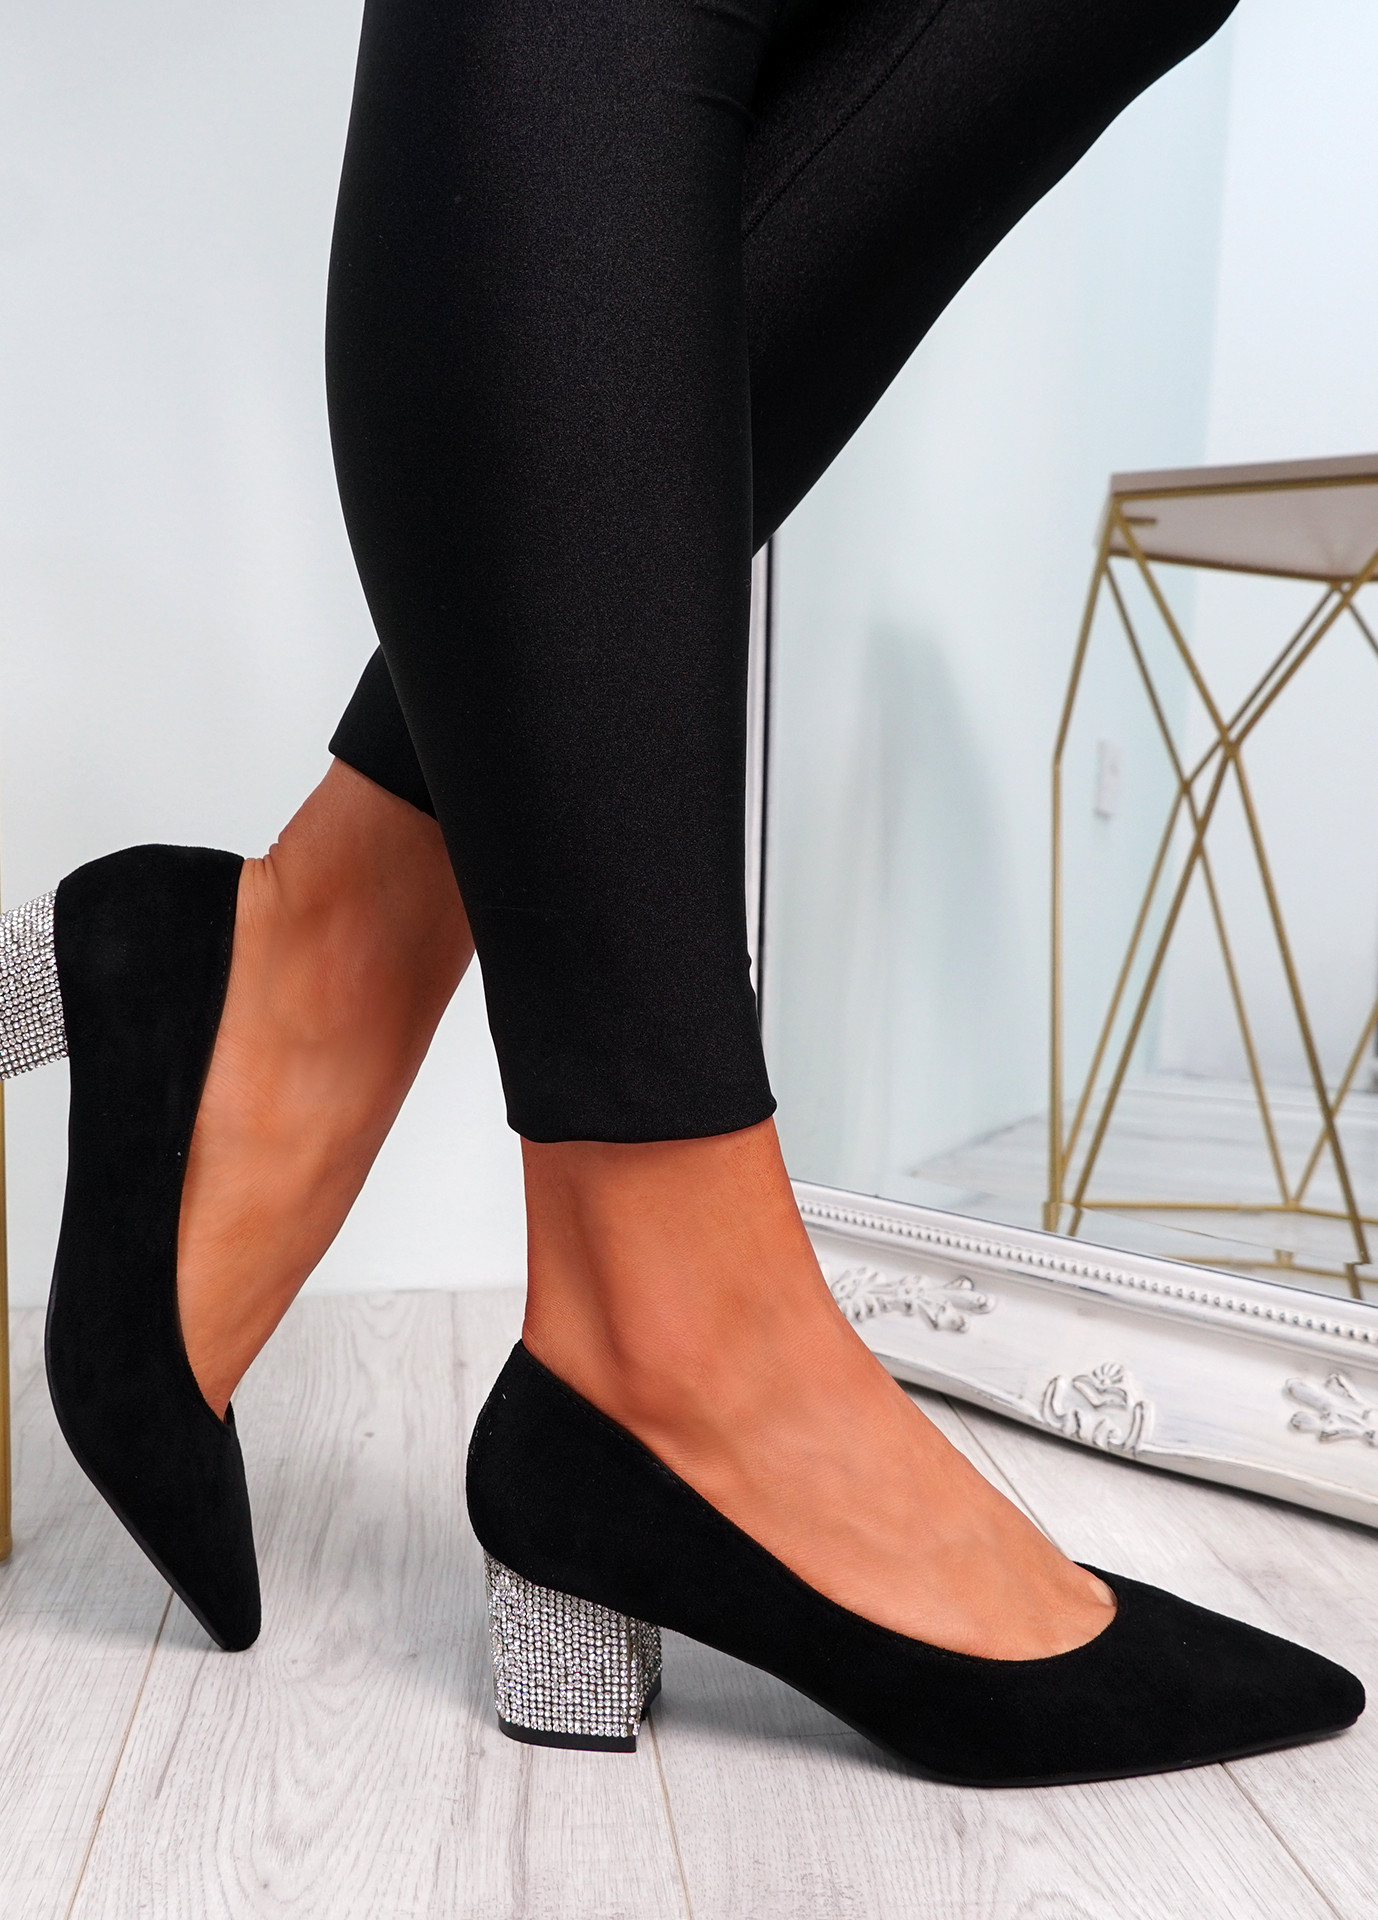 Chami Black Studded Block Heel Pumps